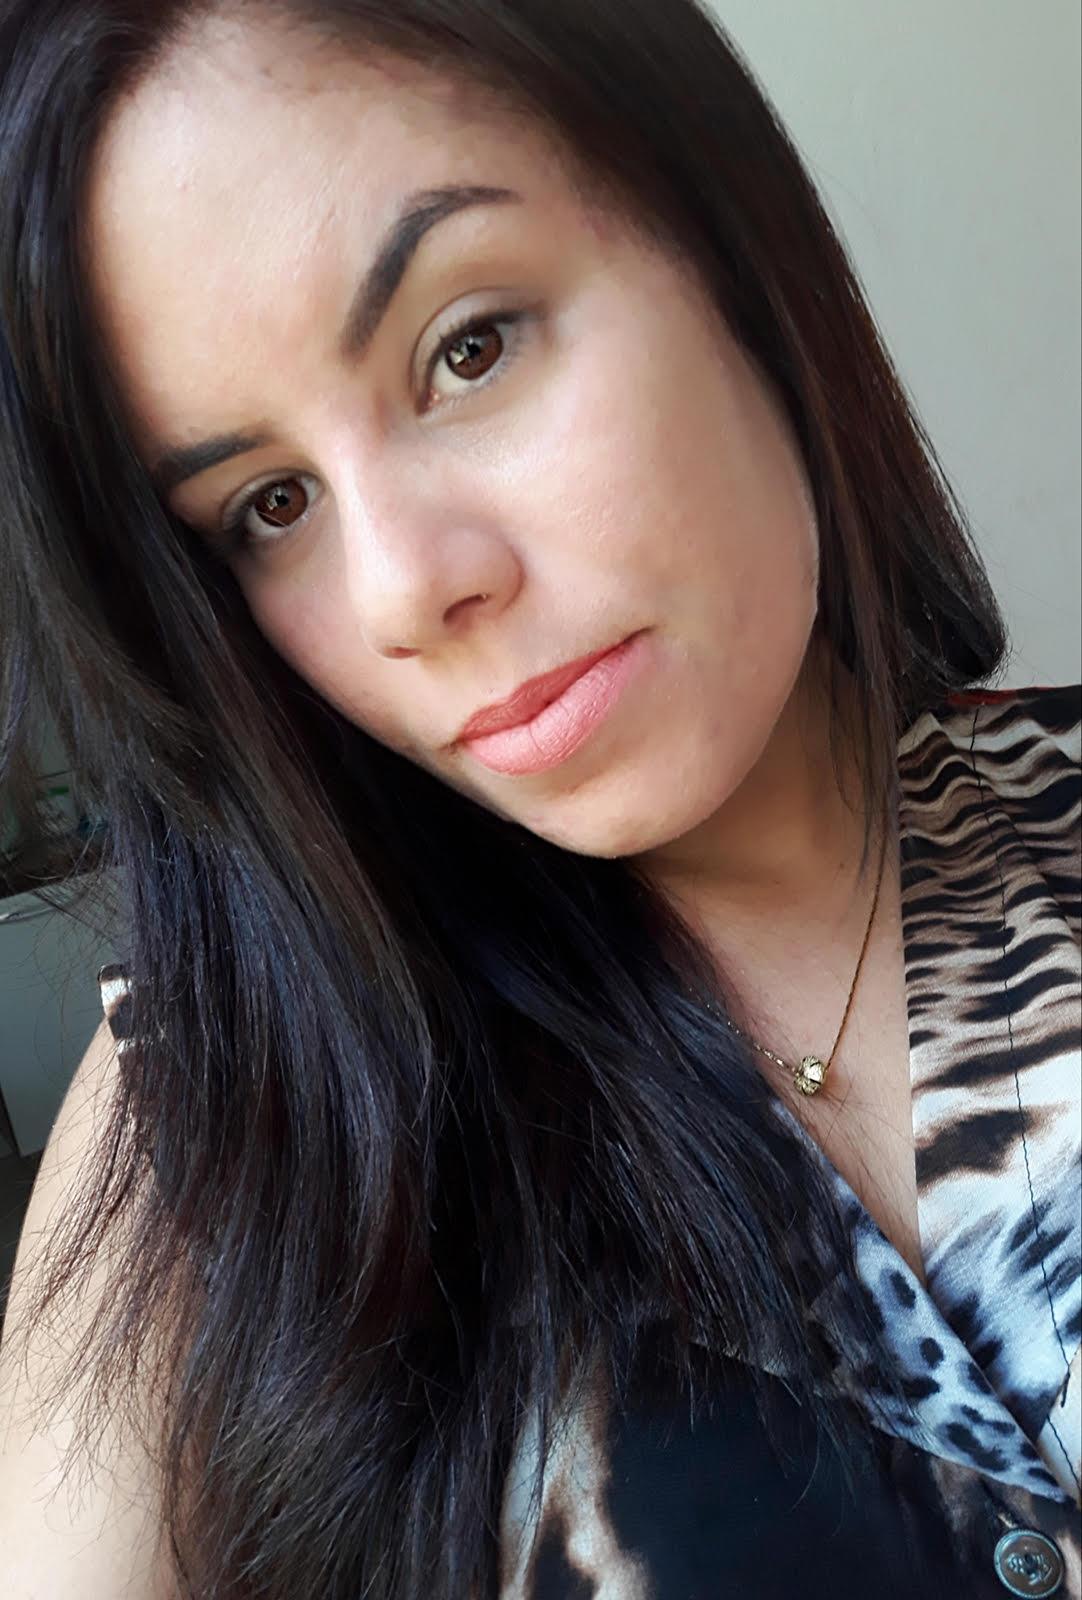 ENTREVISTA: Tais de Souza Alves - Aprovada no XXVII exame da OAB